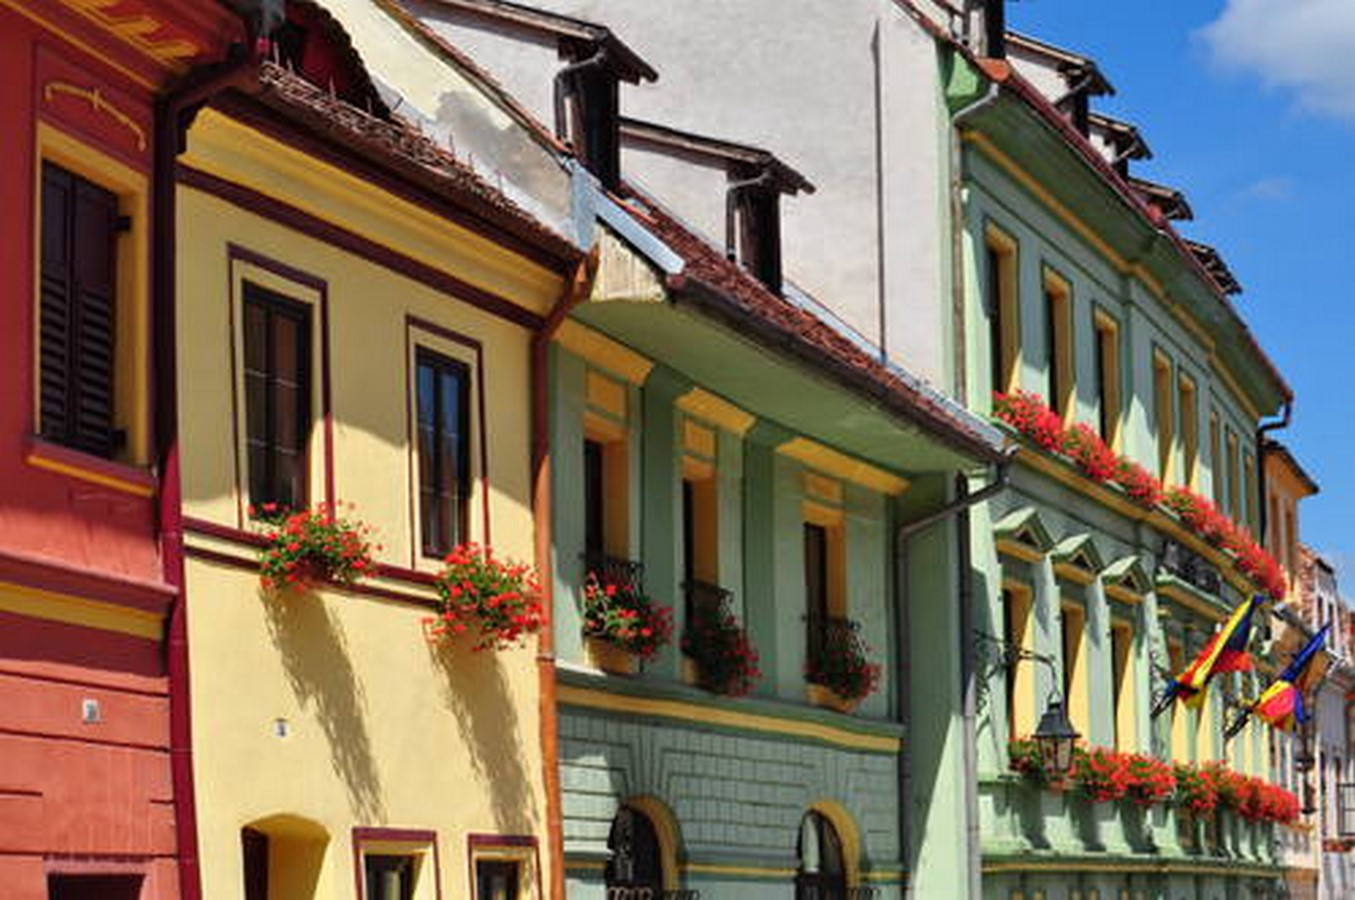 Historic Centre of Sighișoara - Sheet1